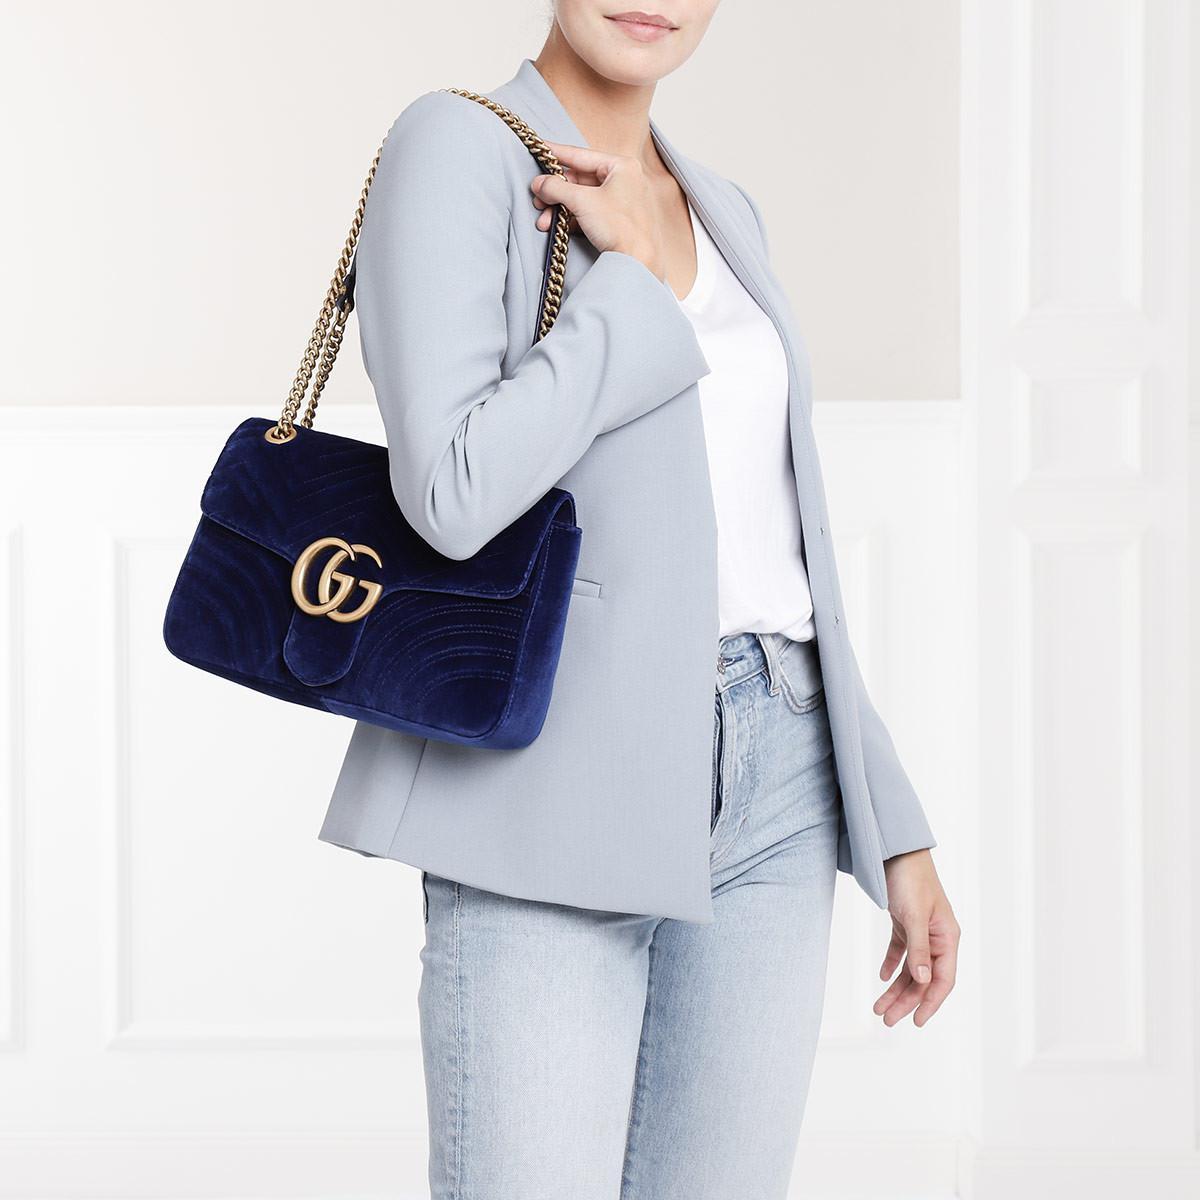 1fda15d54f Gucci Gg Marmont Medium Velvet Shoulder Bag Cobalt in Blue - Lyst